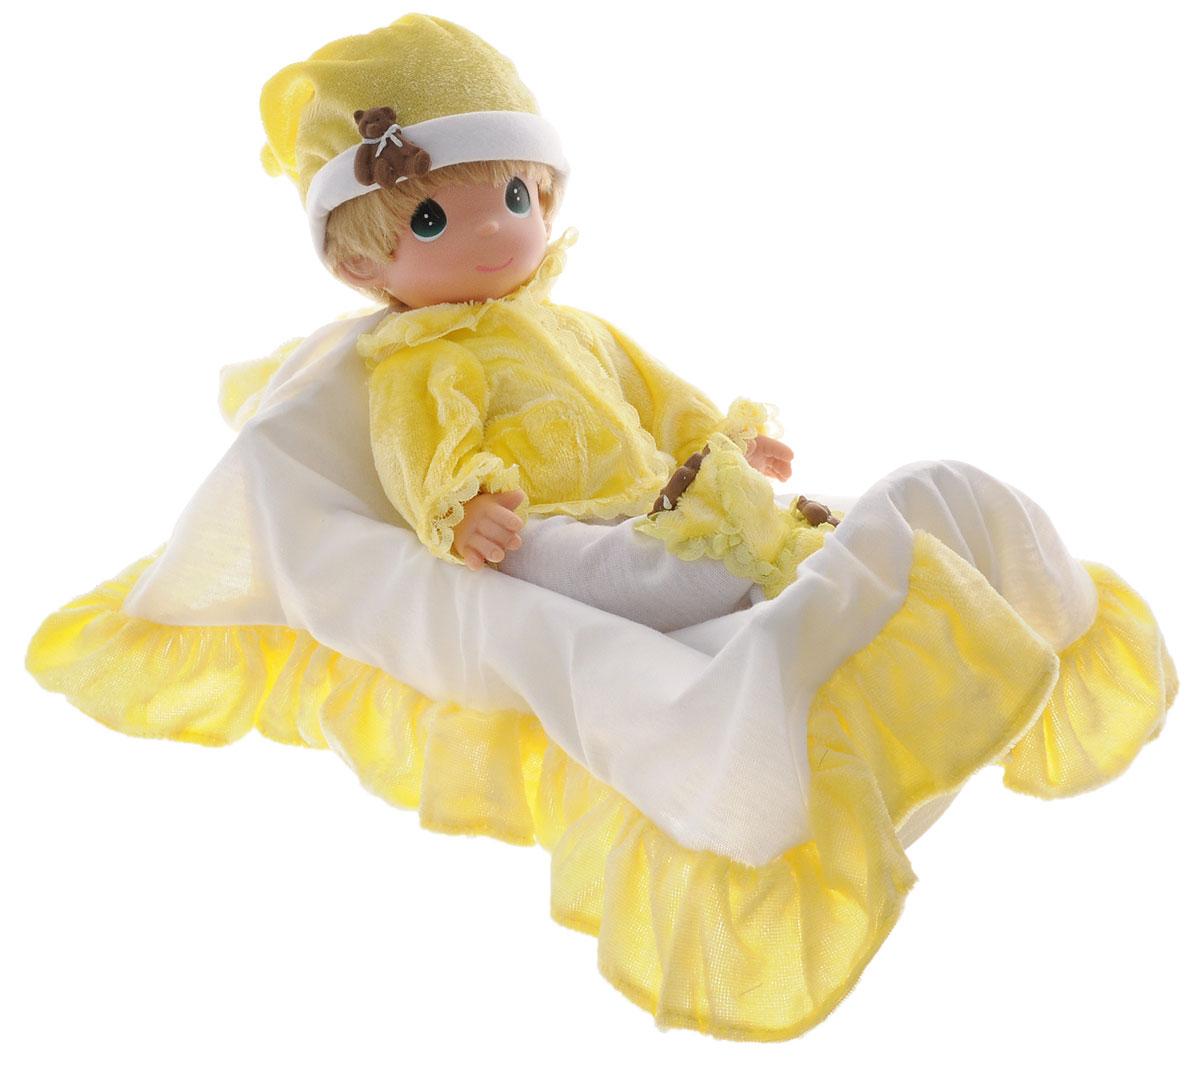 Precious Moments Кукла Рок-бай младенцев мальчик куклы и одежда для кукол precious кукла балерина рыжая 30 см